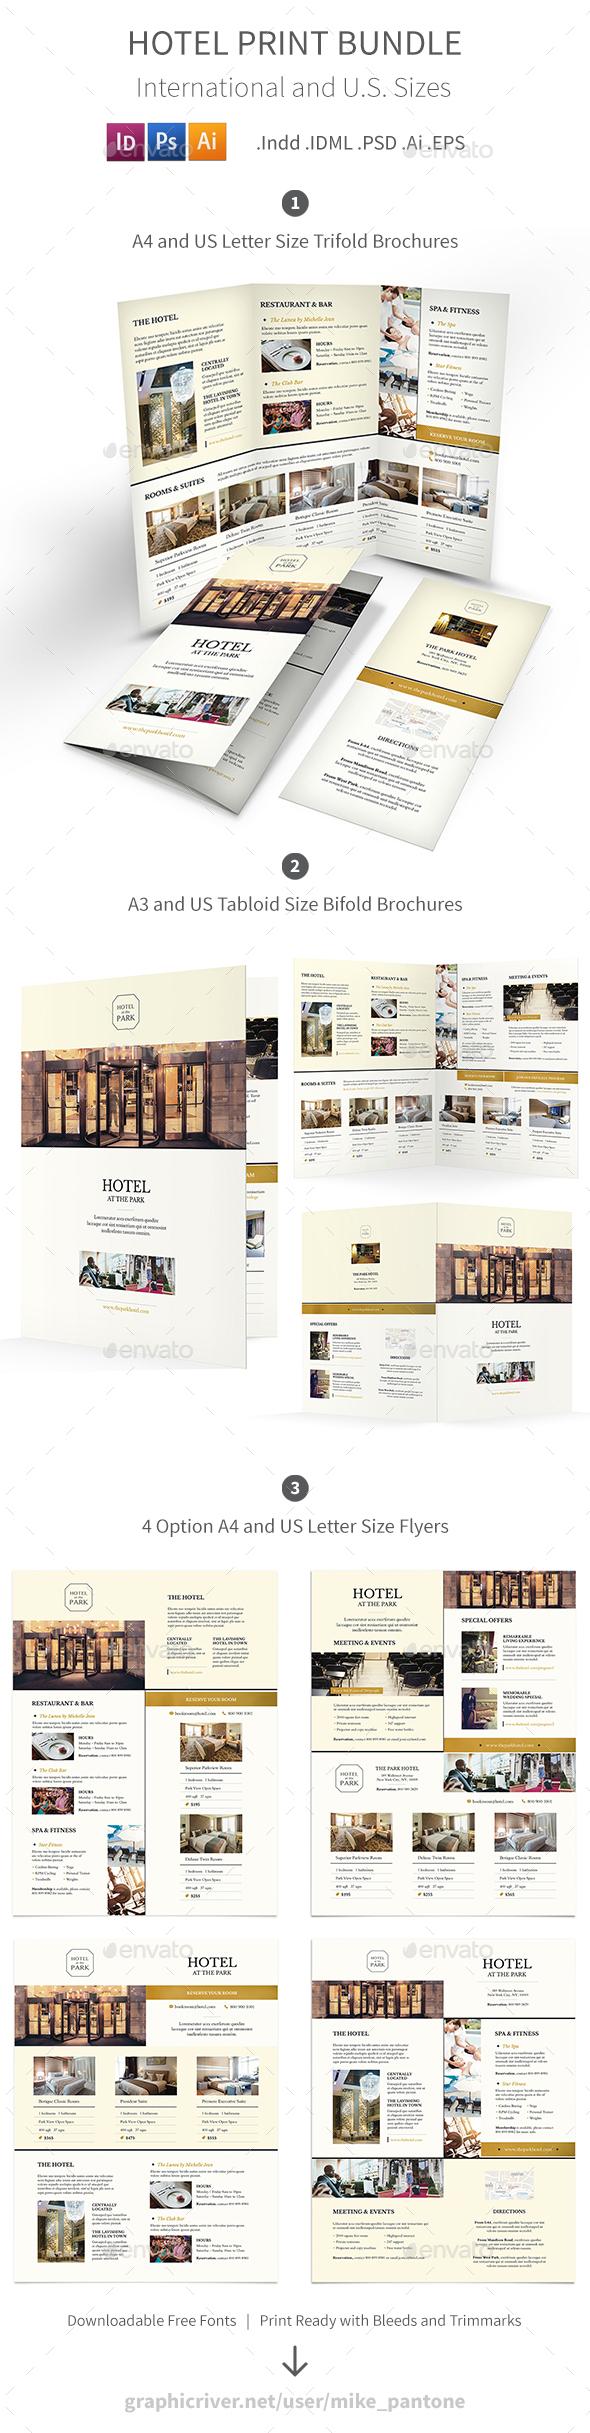 Hotel Print Bundle 6 - Informational Brochures